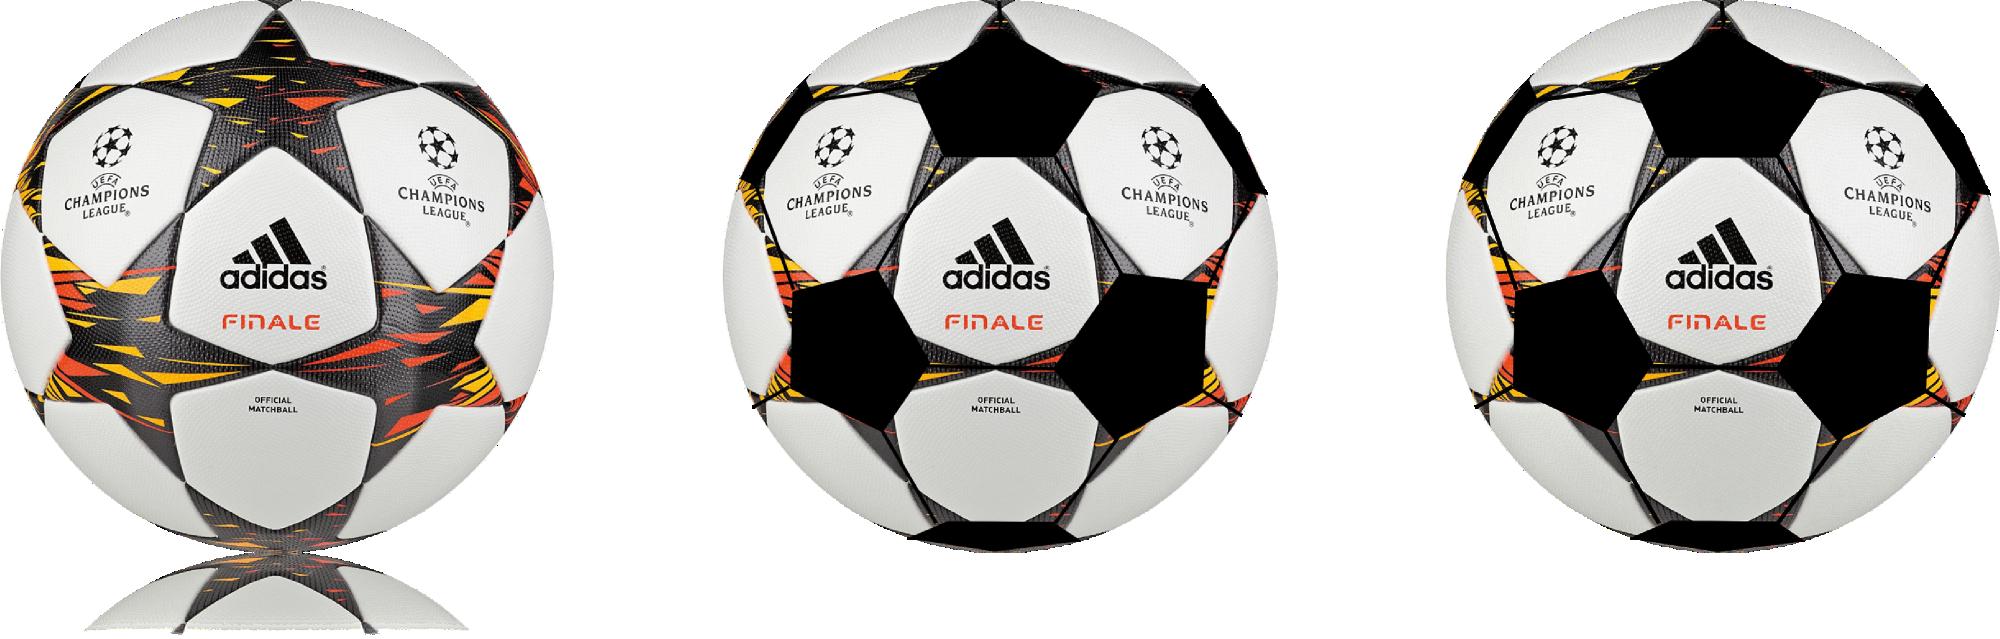 Les ballons de football   Kidi'science